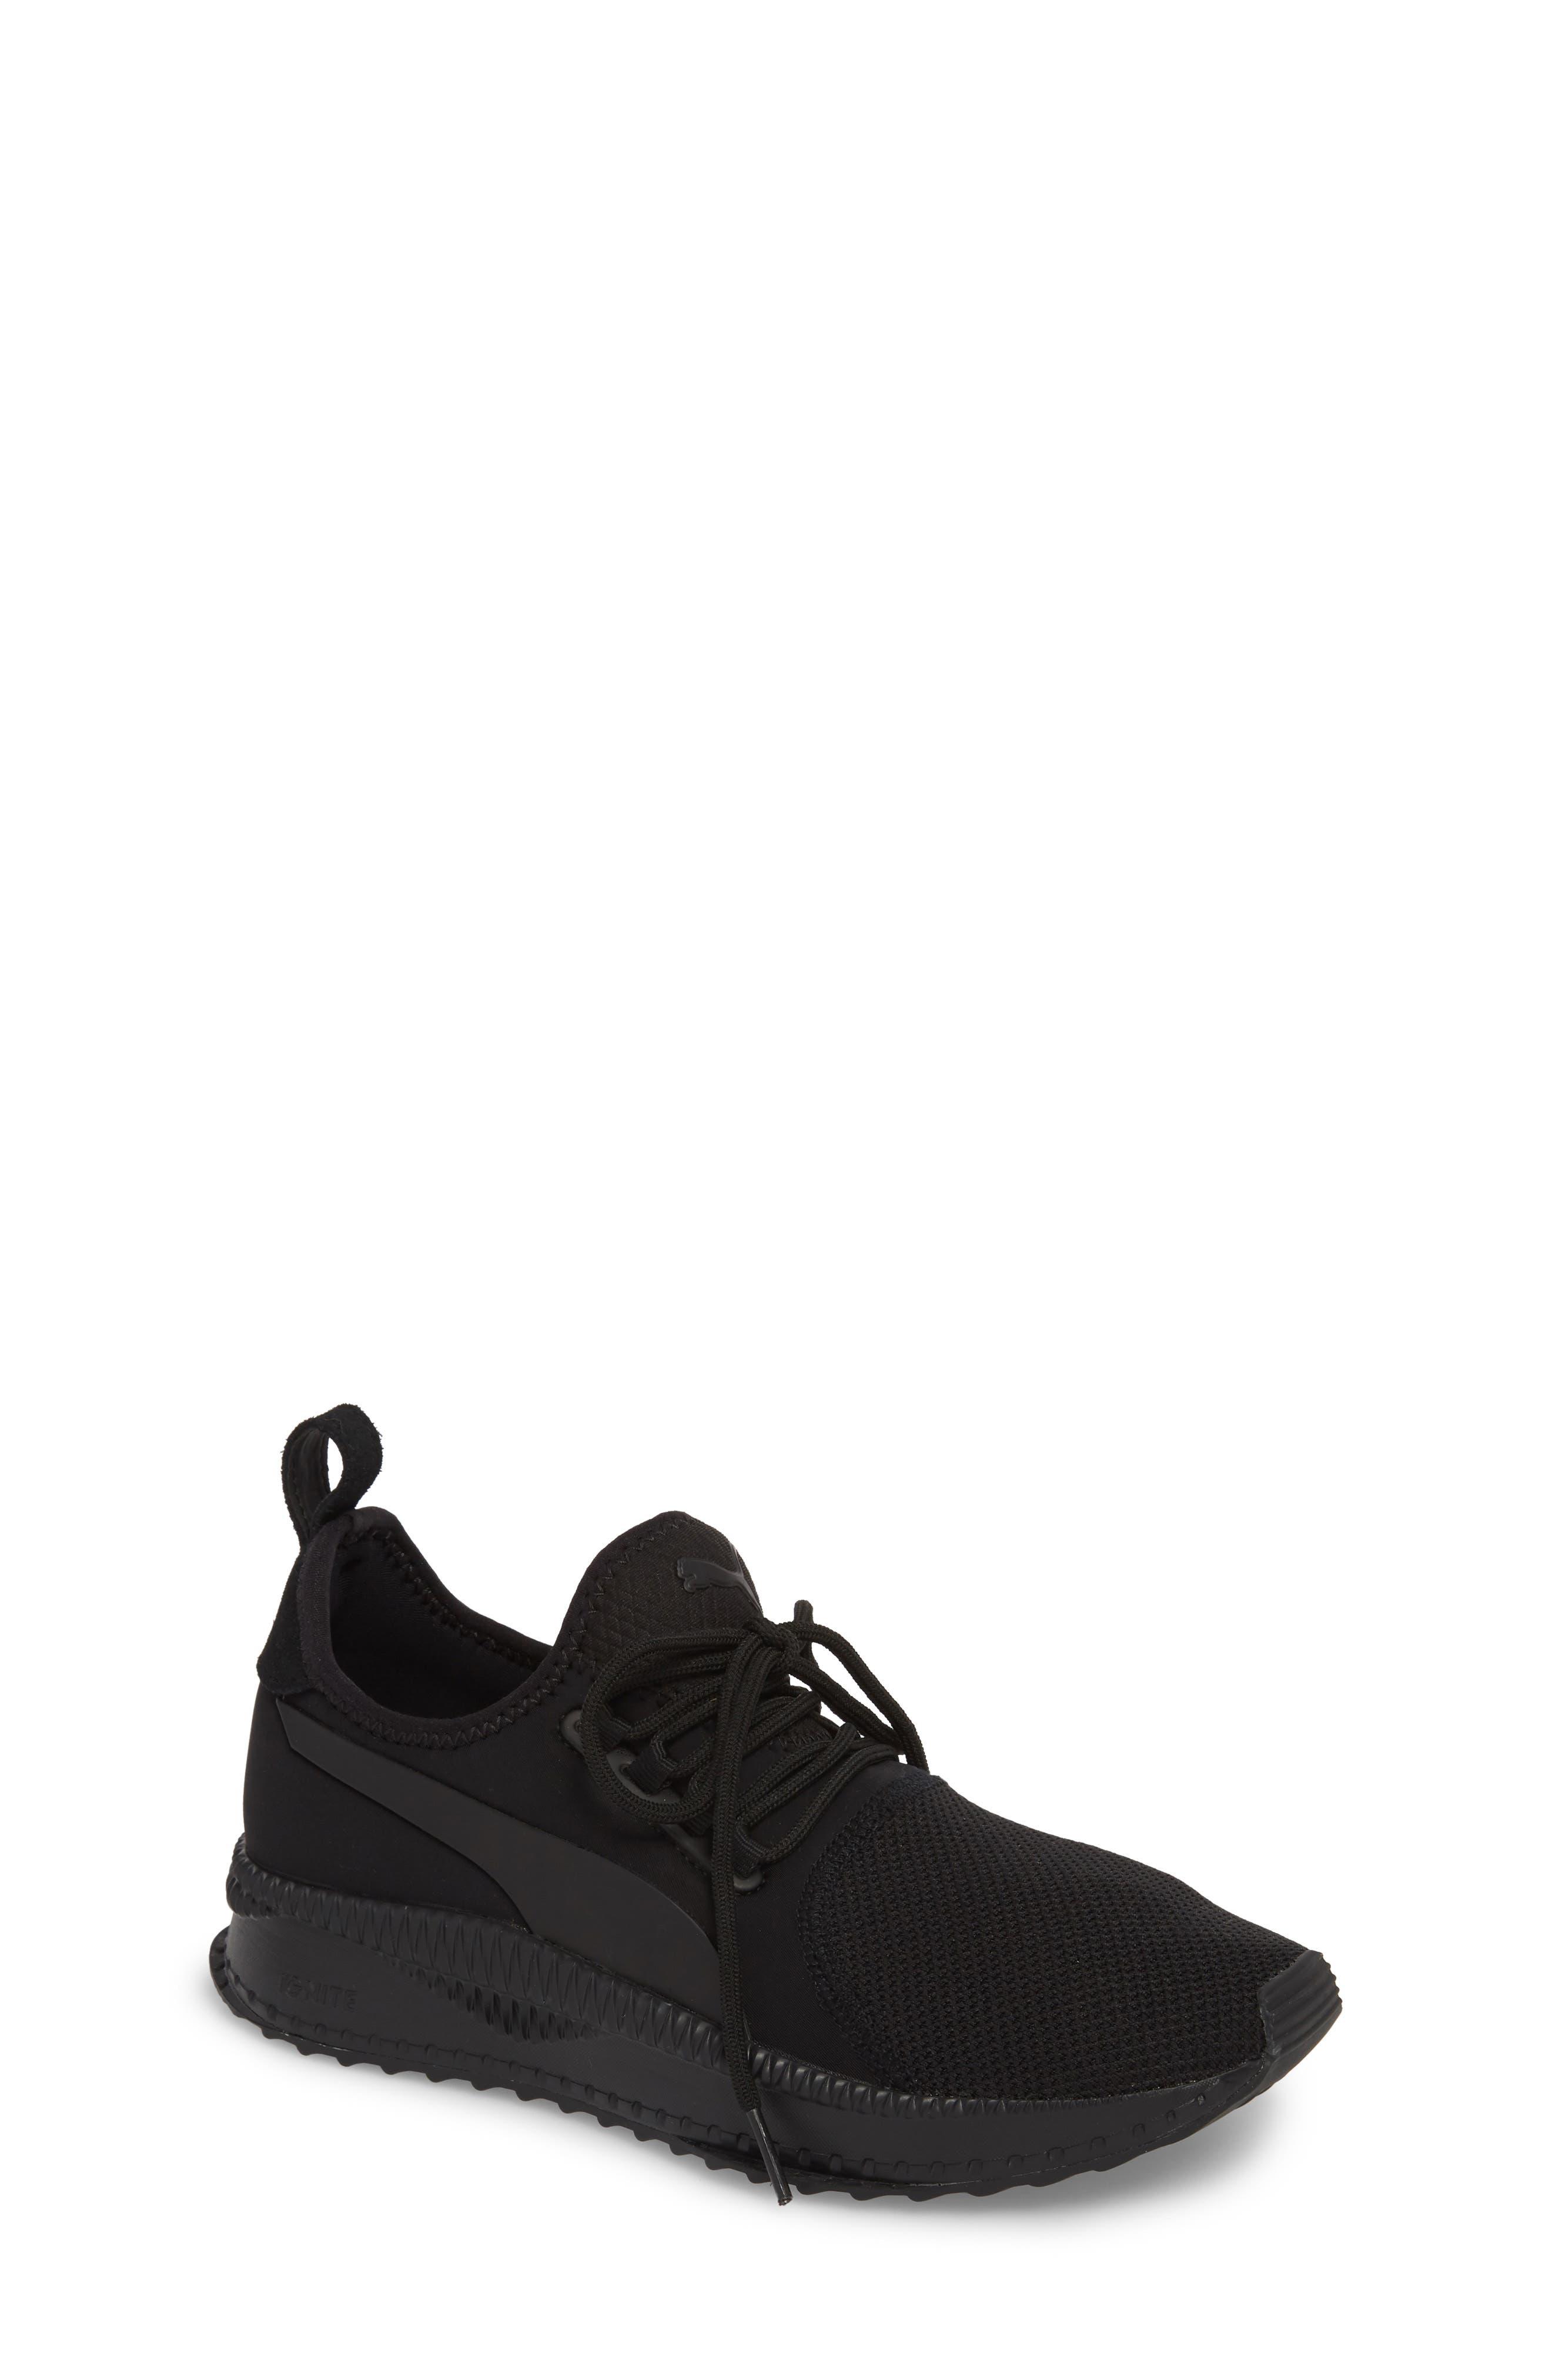 Tsugi Apex Sneaker,                             Main thumbnail 1, color,                             001